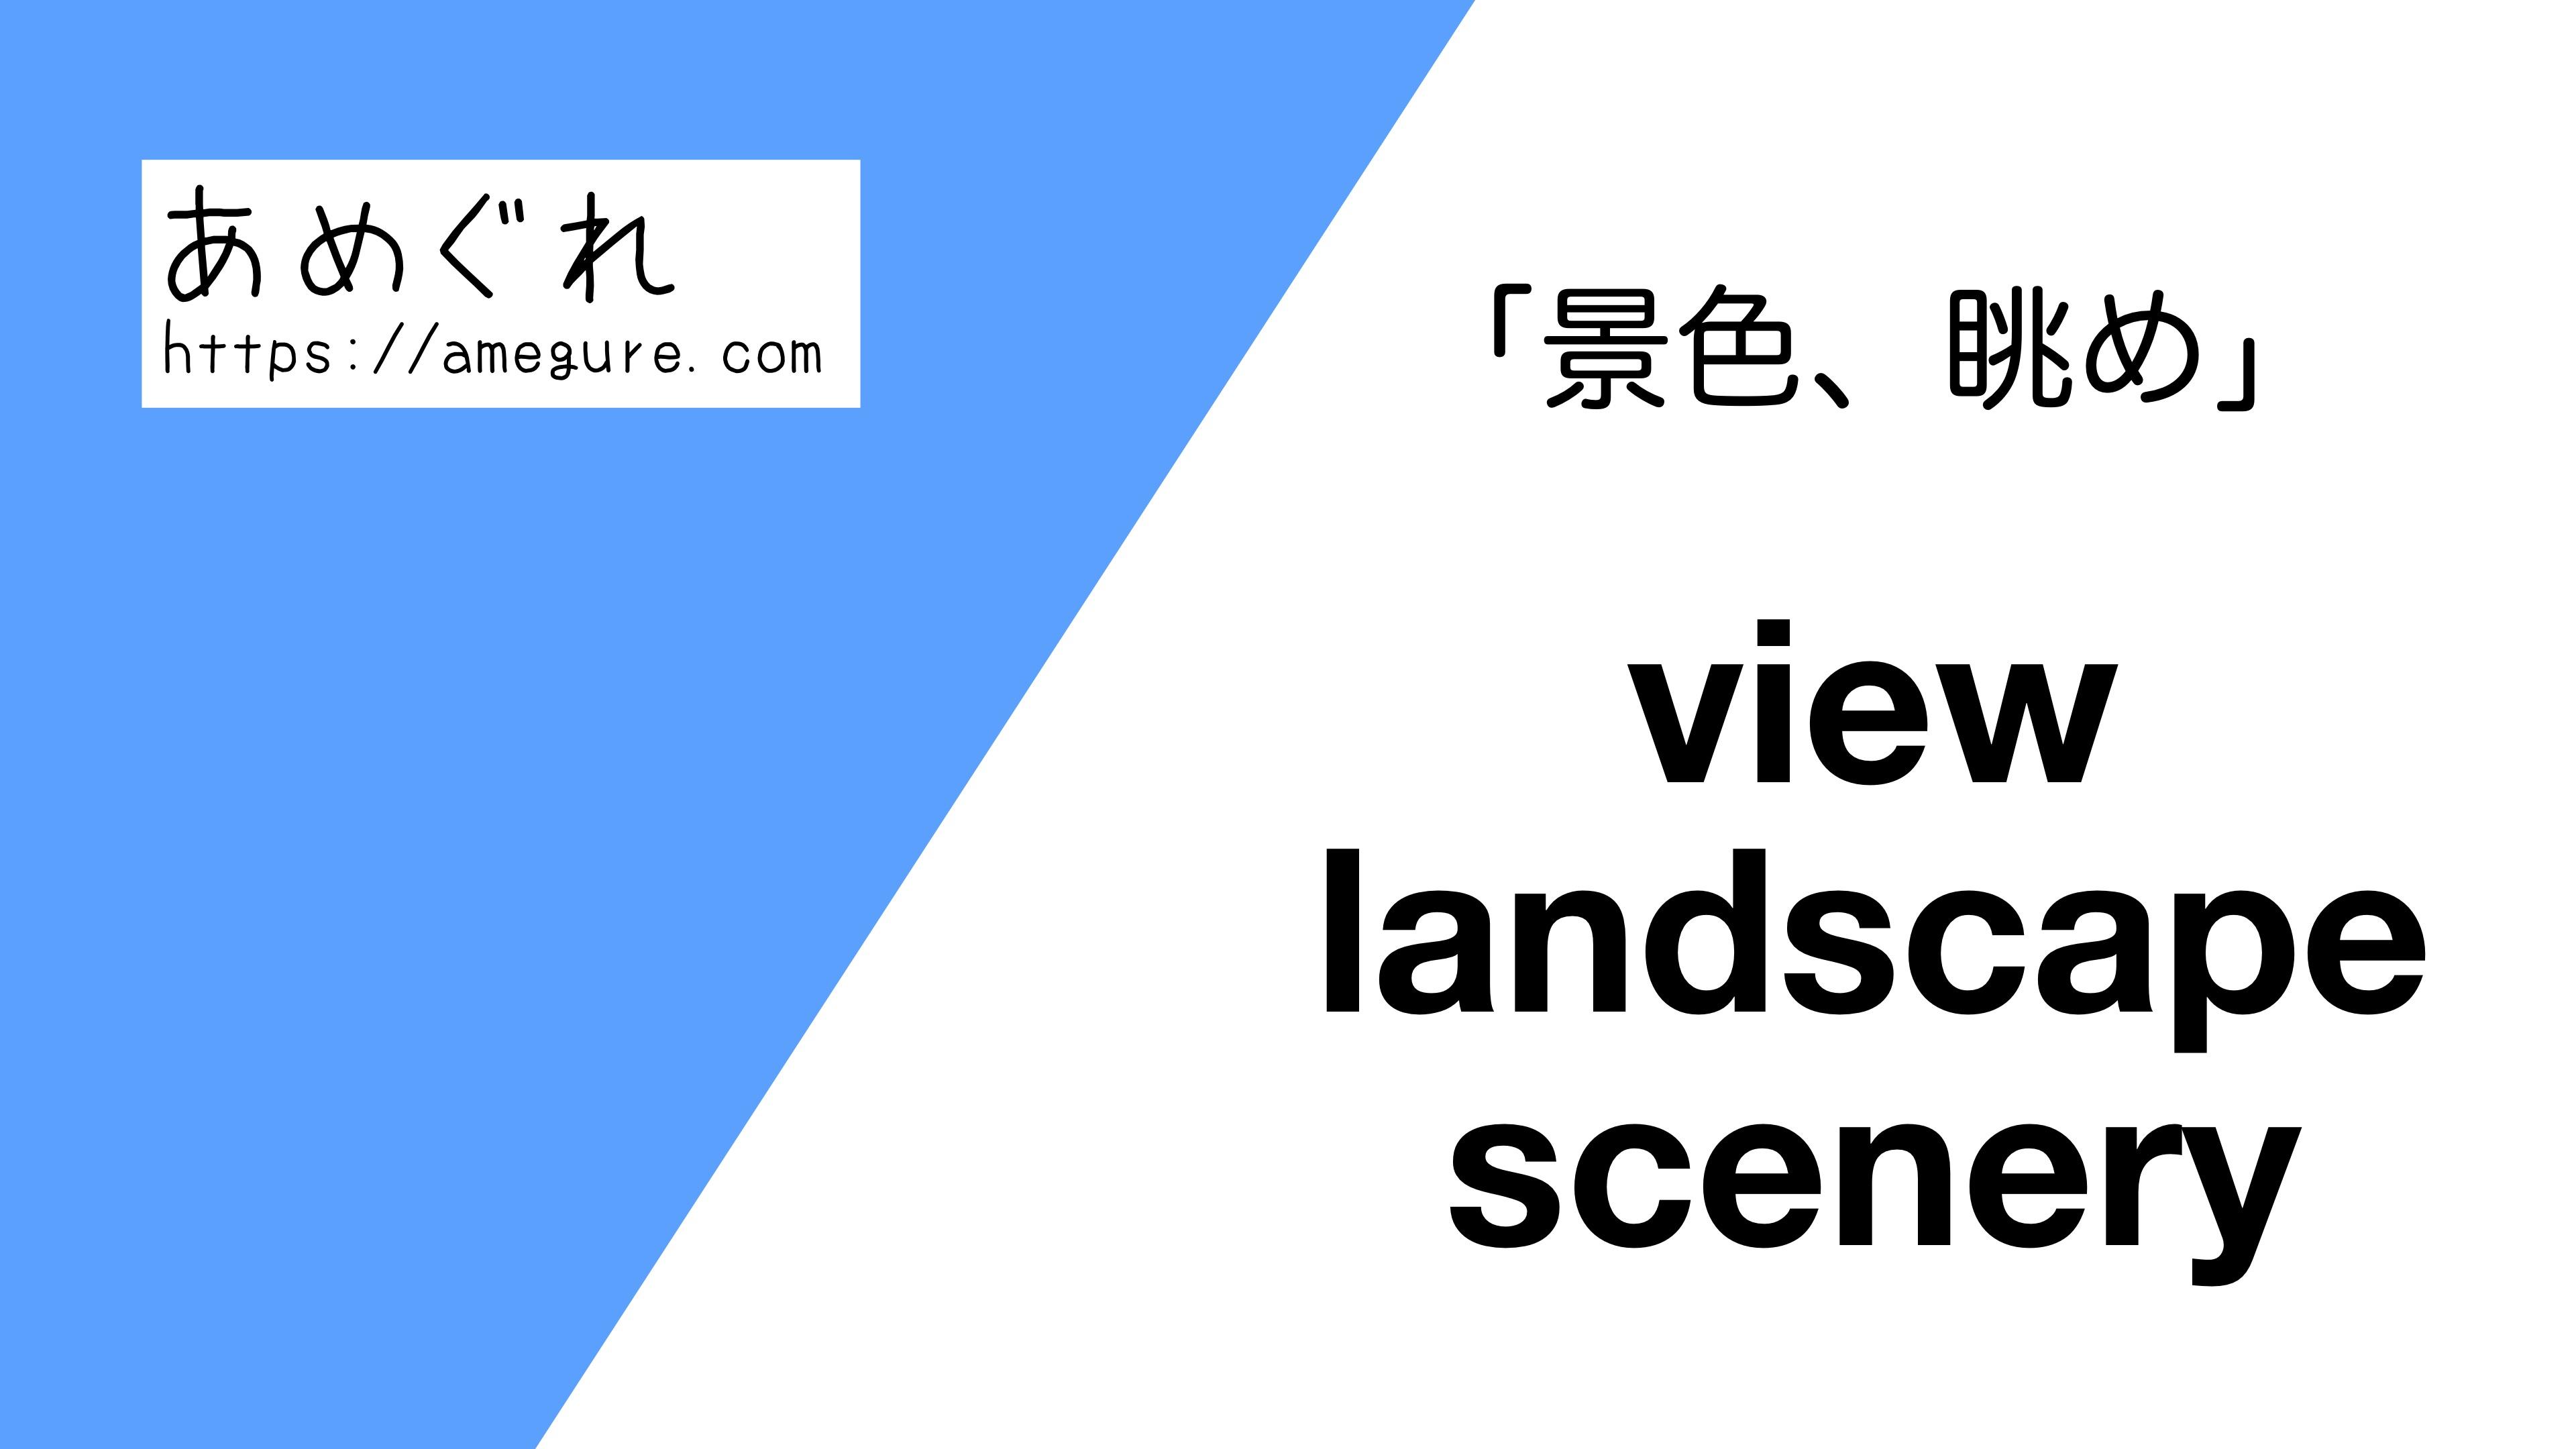 view-landscape-scenery違い